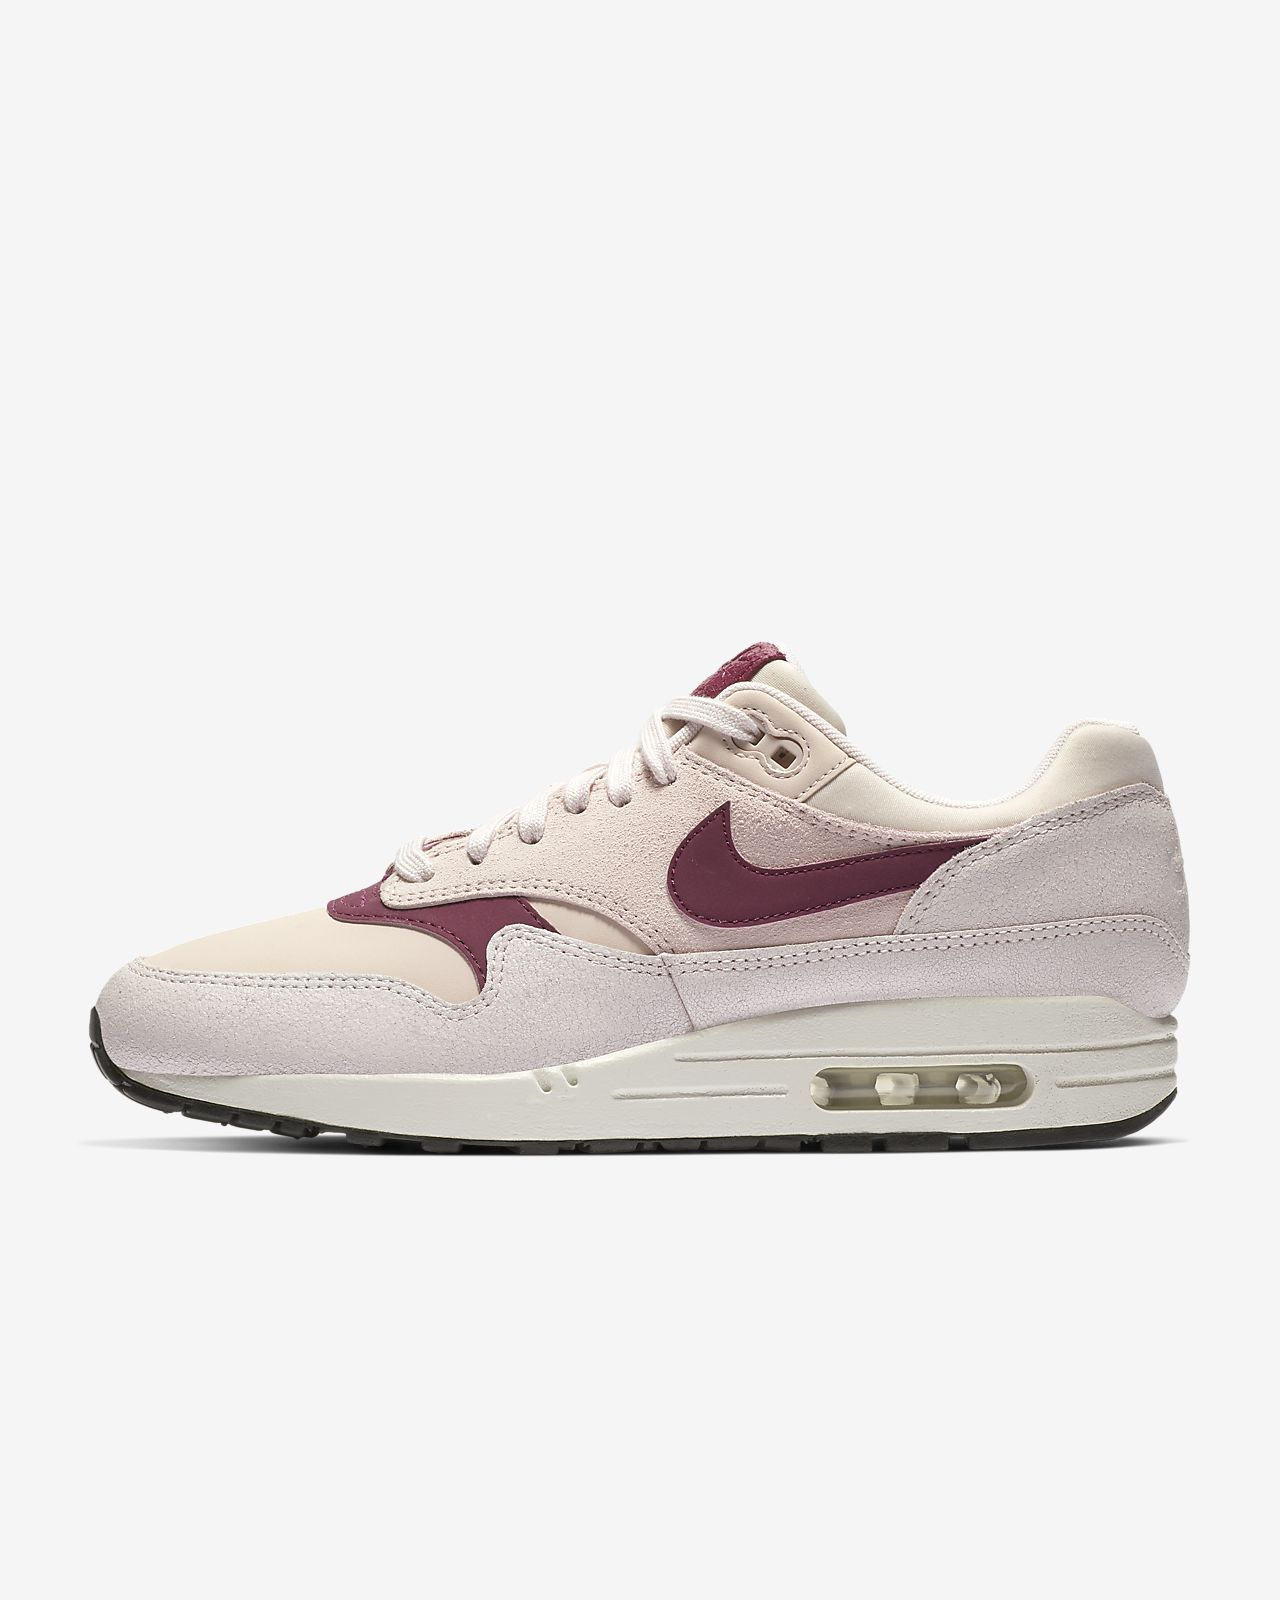 separation shoes 5c8b5 07e8f ... Nike Air Max 1 Premium - sko til kvinder